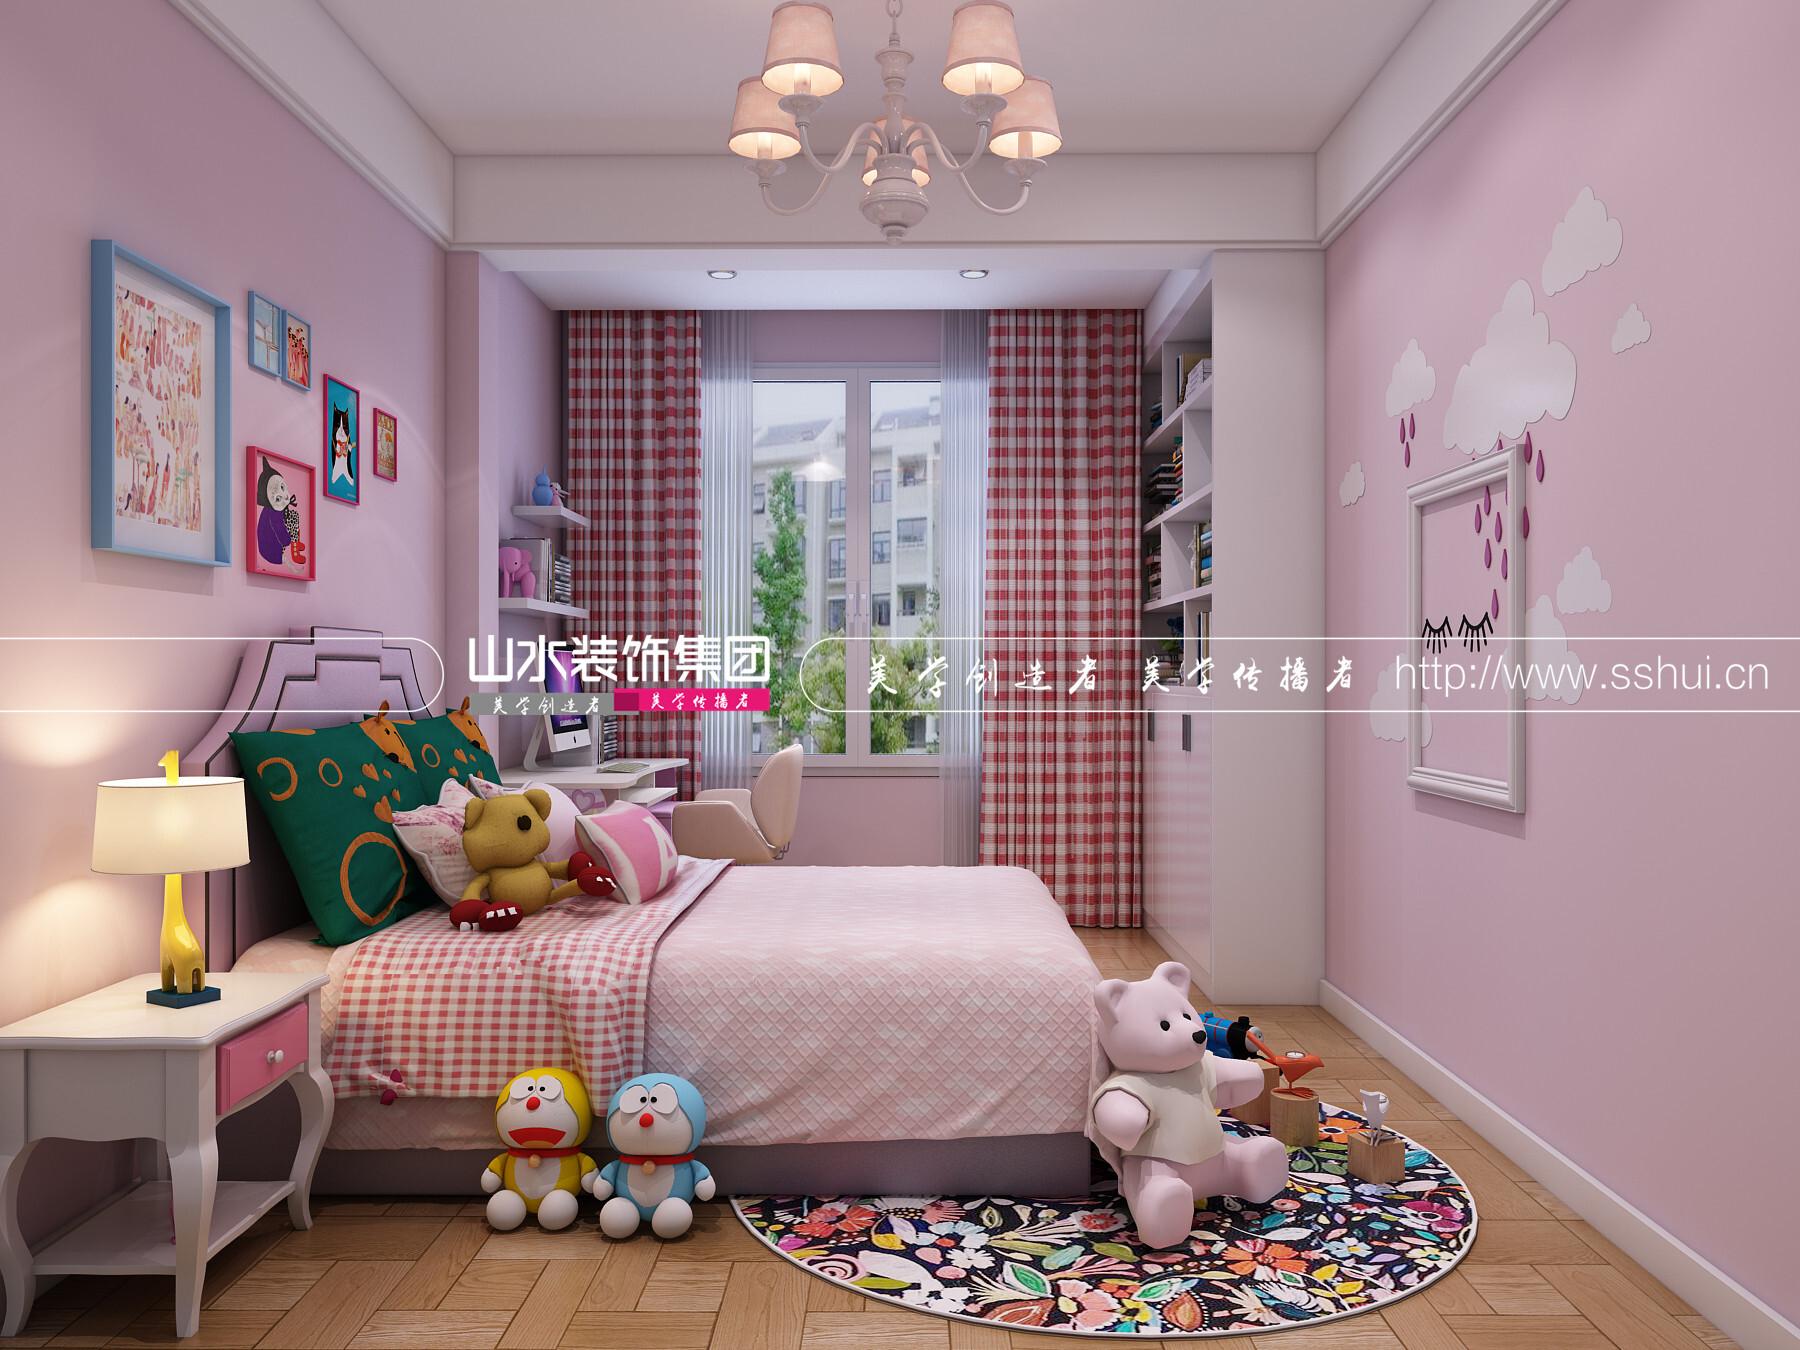 <span style='color: #ff0000'>儿童房装修</span>设计如何对安全方面进行考虑?